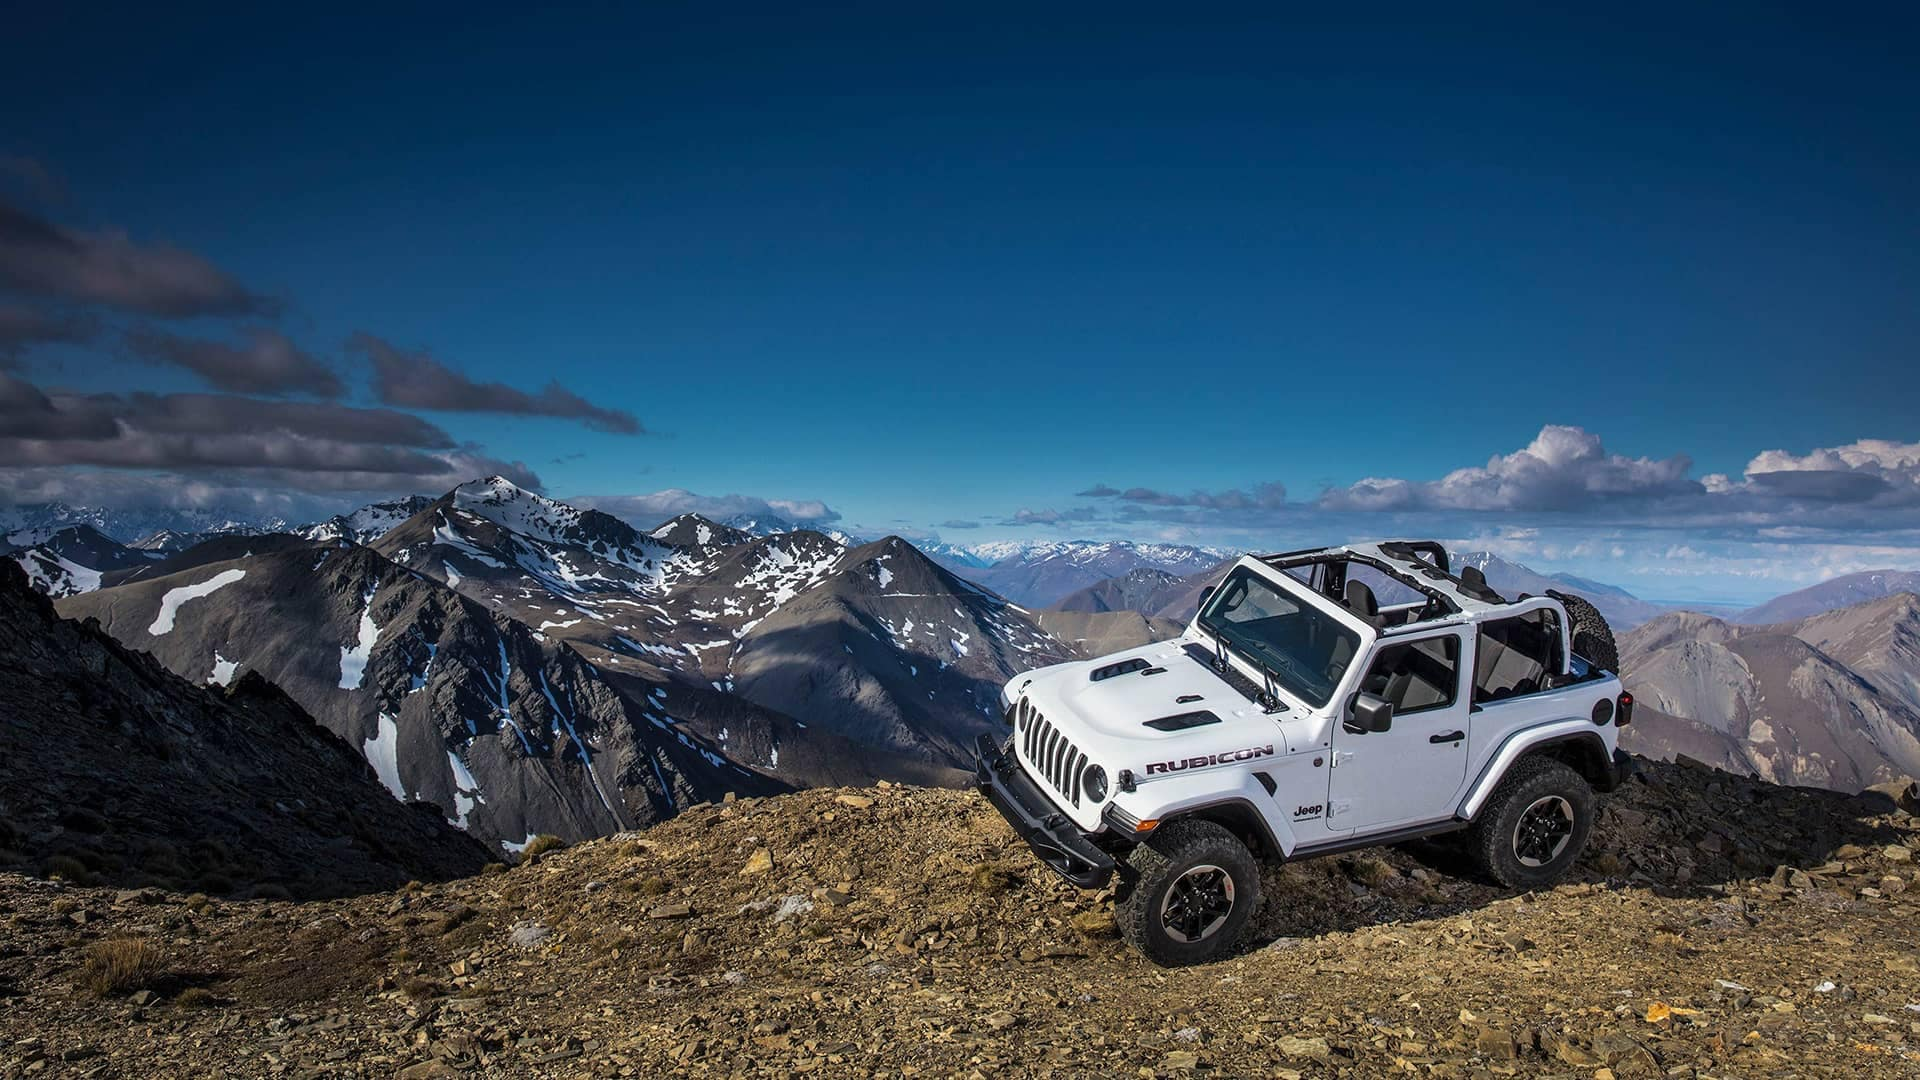 Jeep Wrangler Model Options